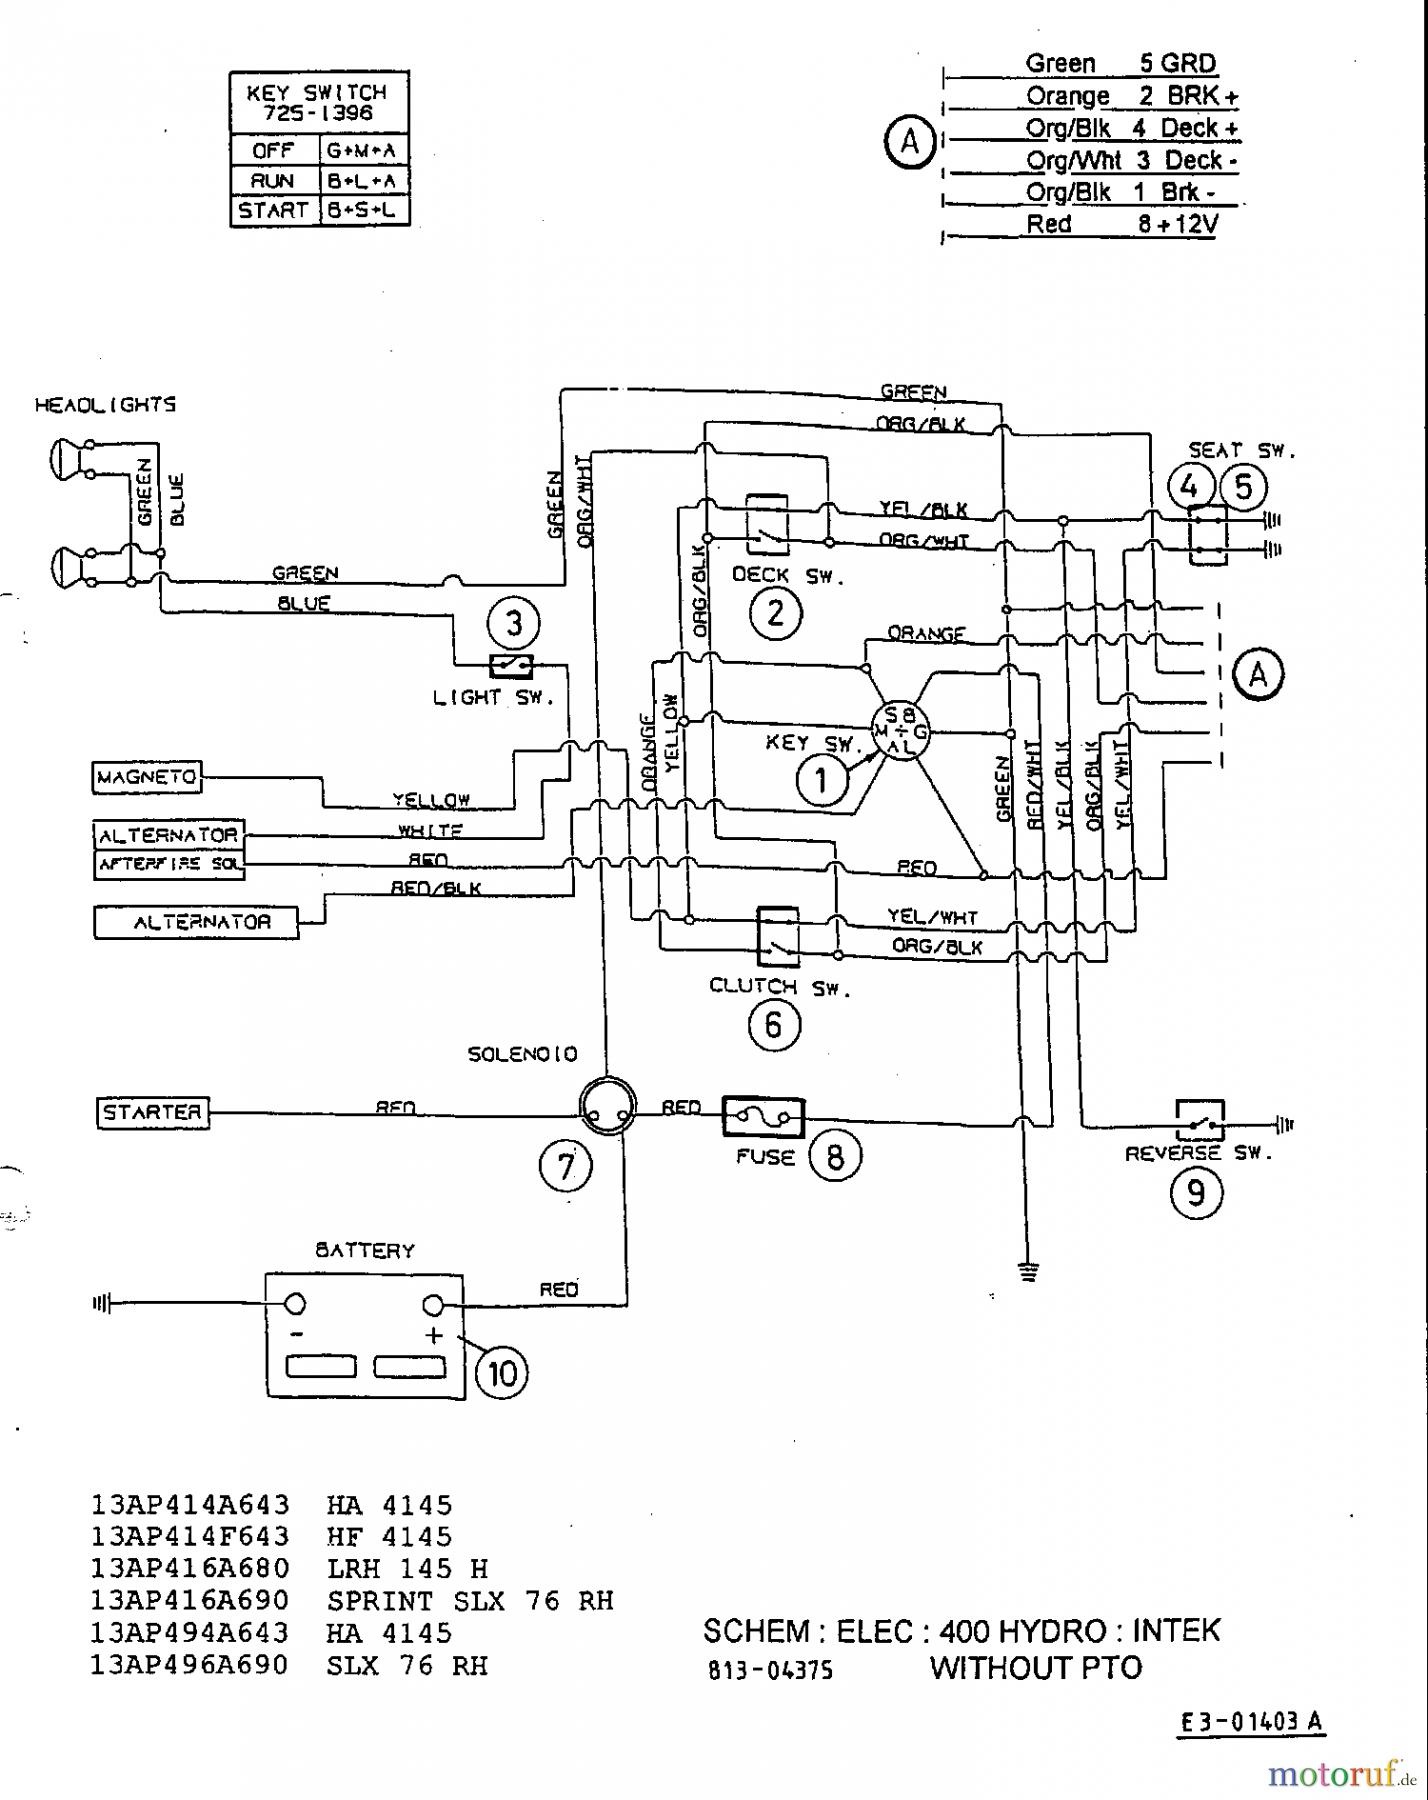 Mtd Riding Mower Wiring Diagram With Yard Machine On | Mtd Ride On - Mtd Riding Lawn Mower Wiring Diagram